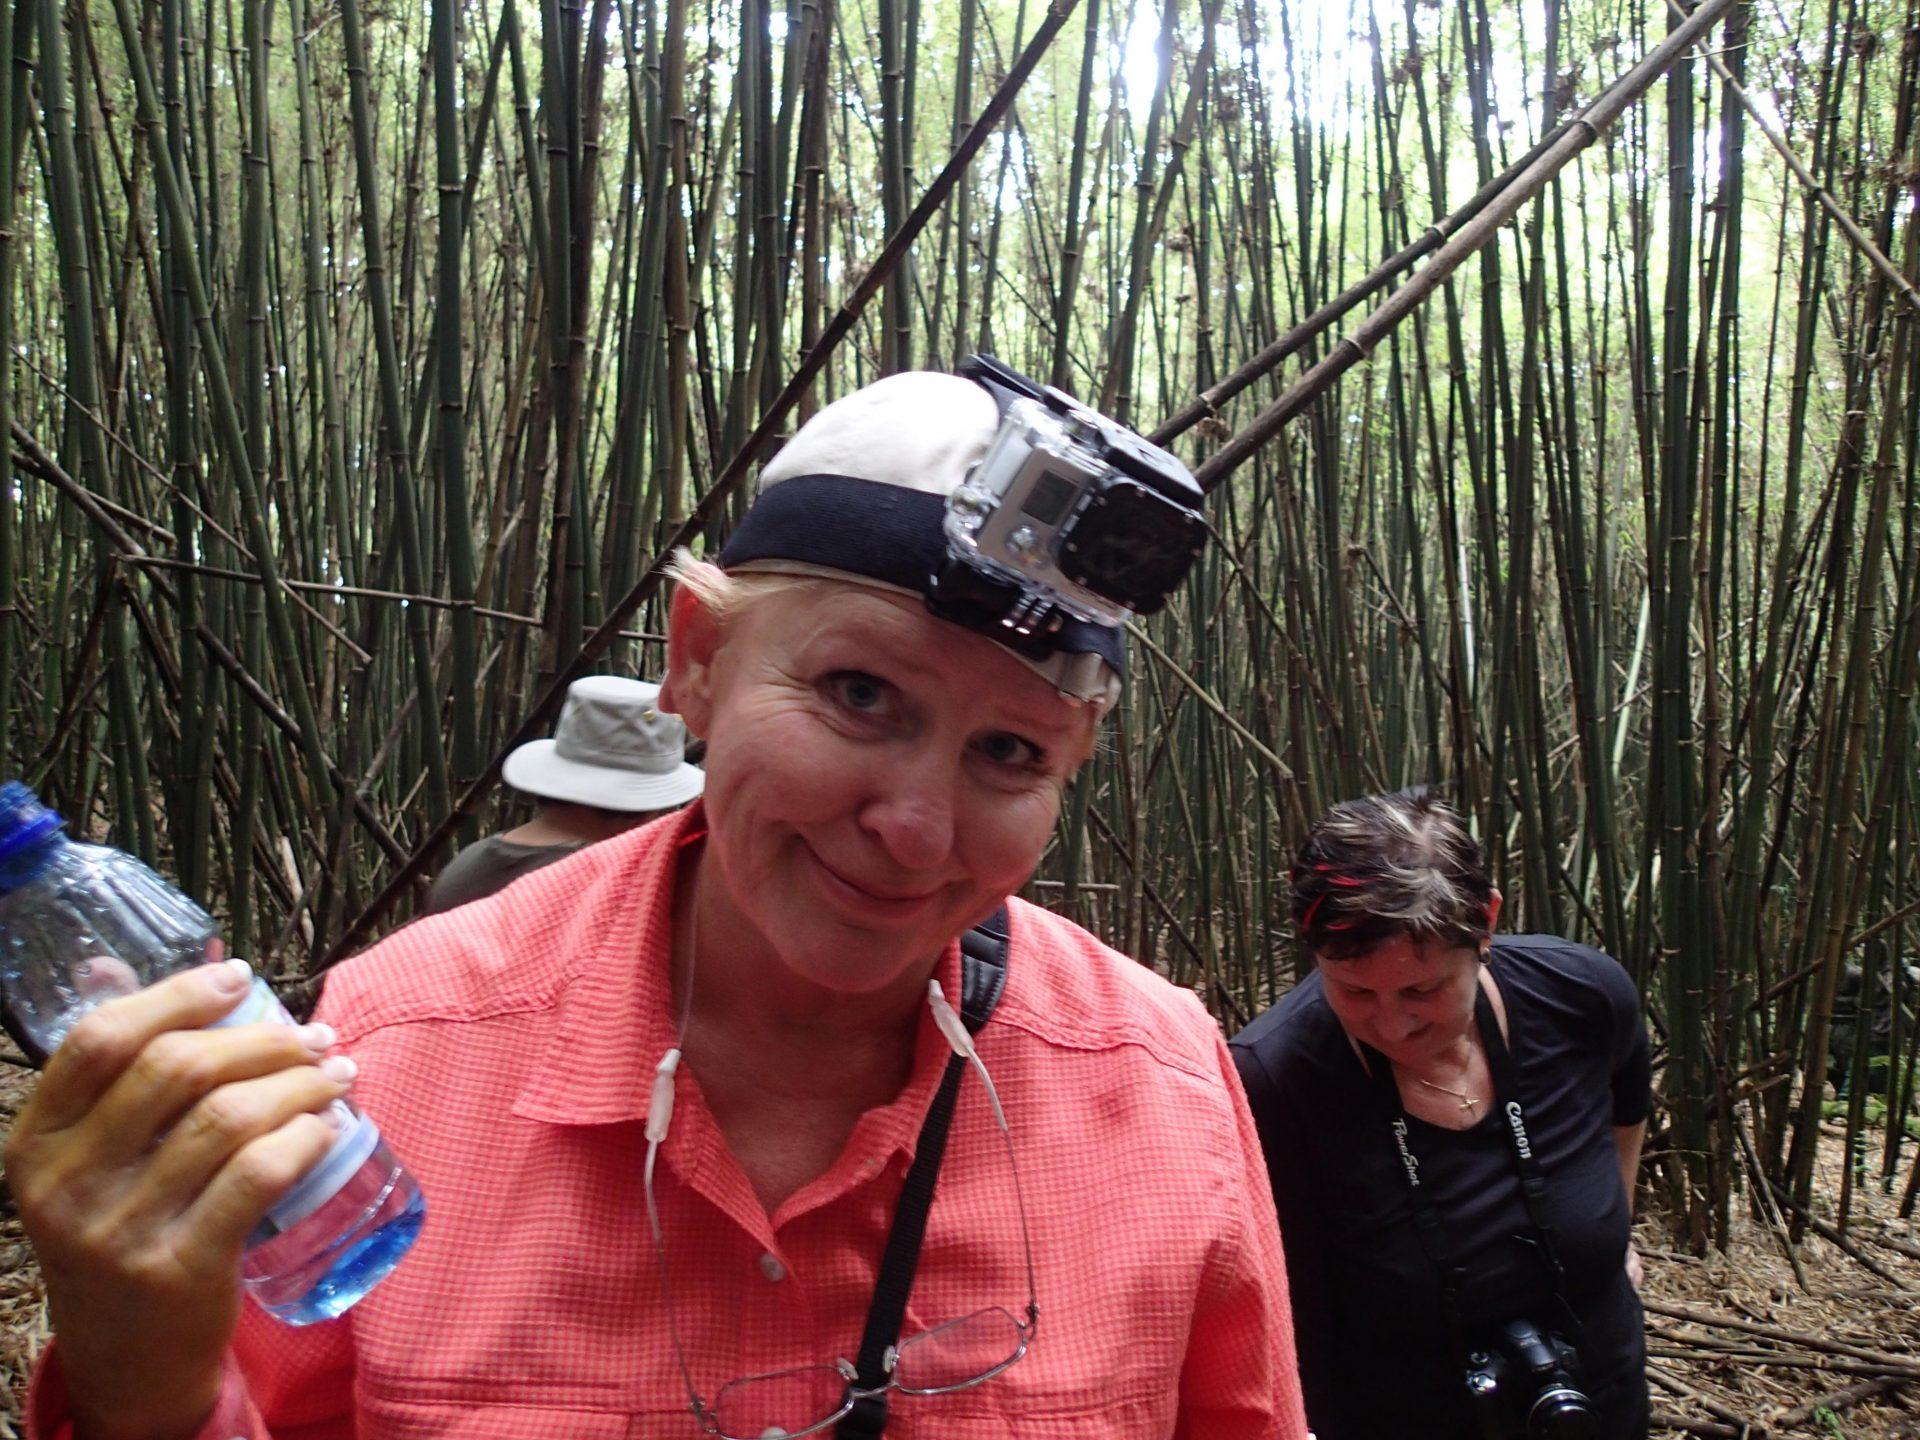 Sandi with a small camera, a Go Pro on her head and her trusty Nikon.  Following gorillas in Rwanda.